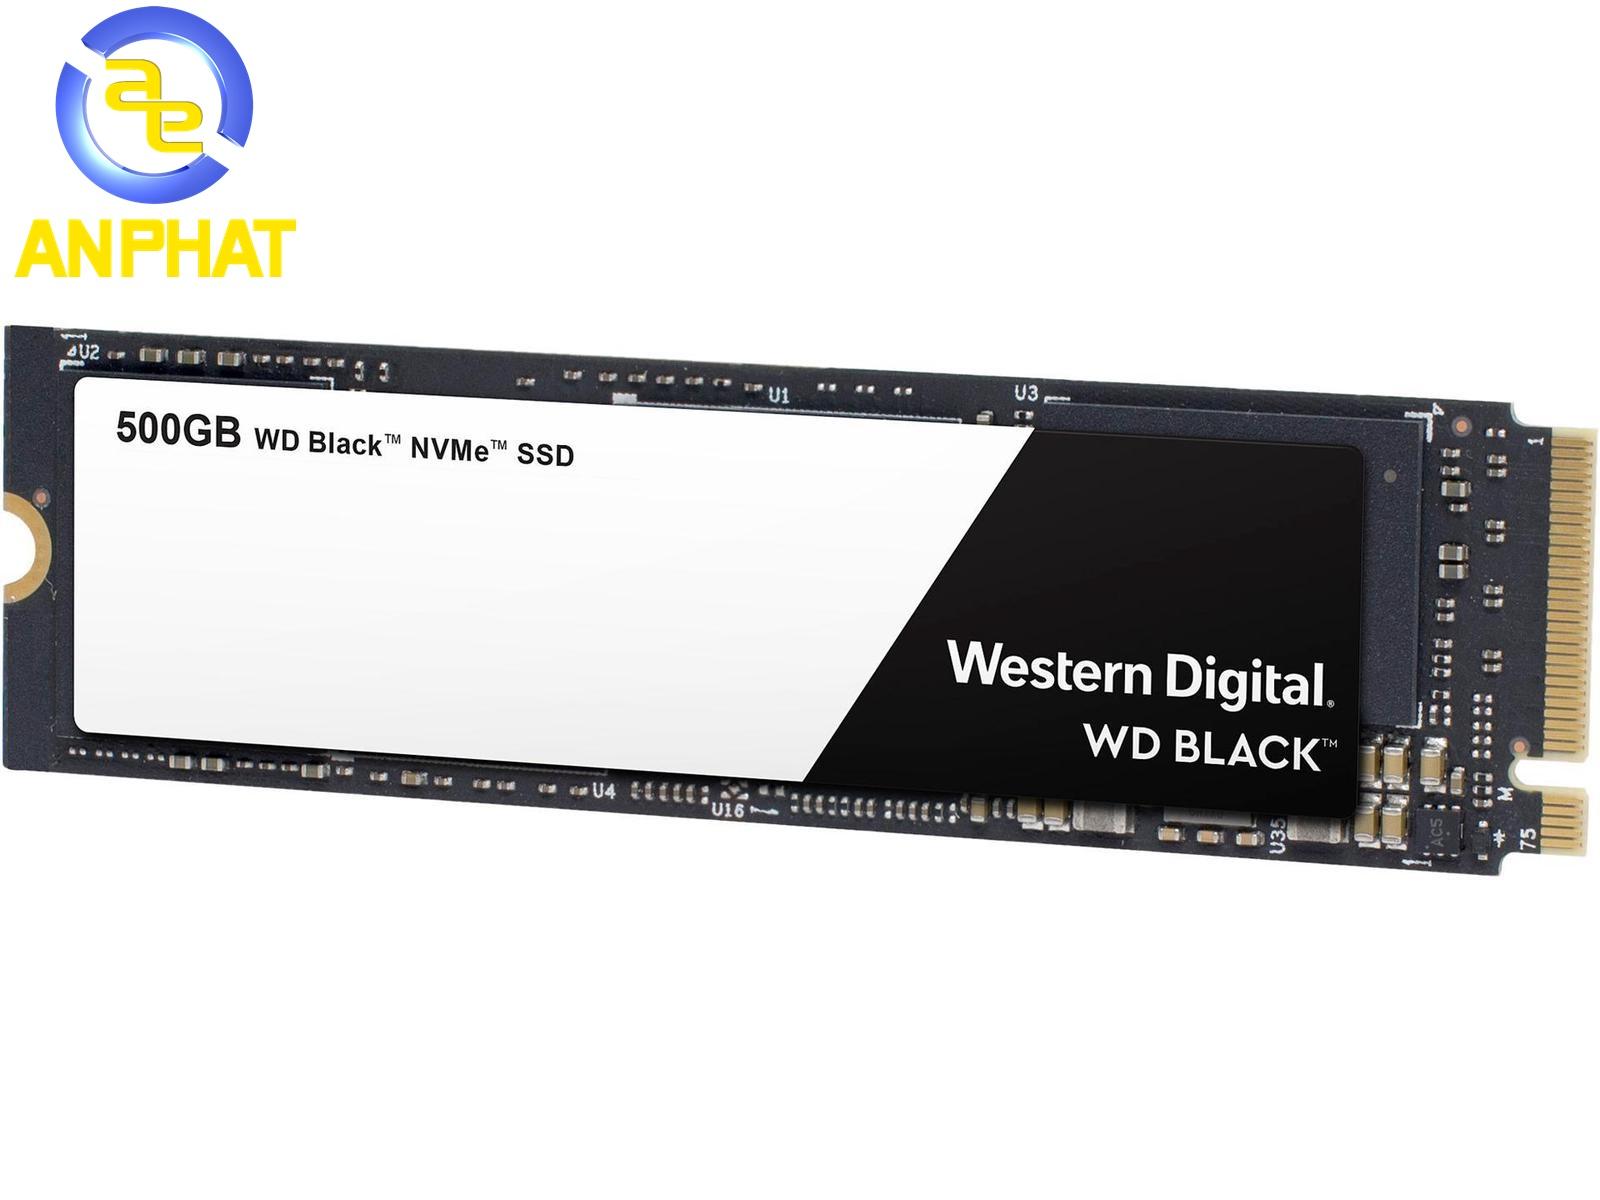 M.2 2280 8 Gb//s WD Black 500GB High-Performance NVMe PCIe Internal SSD NEW